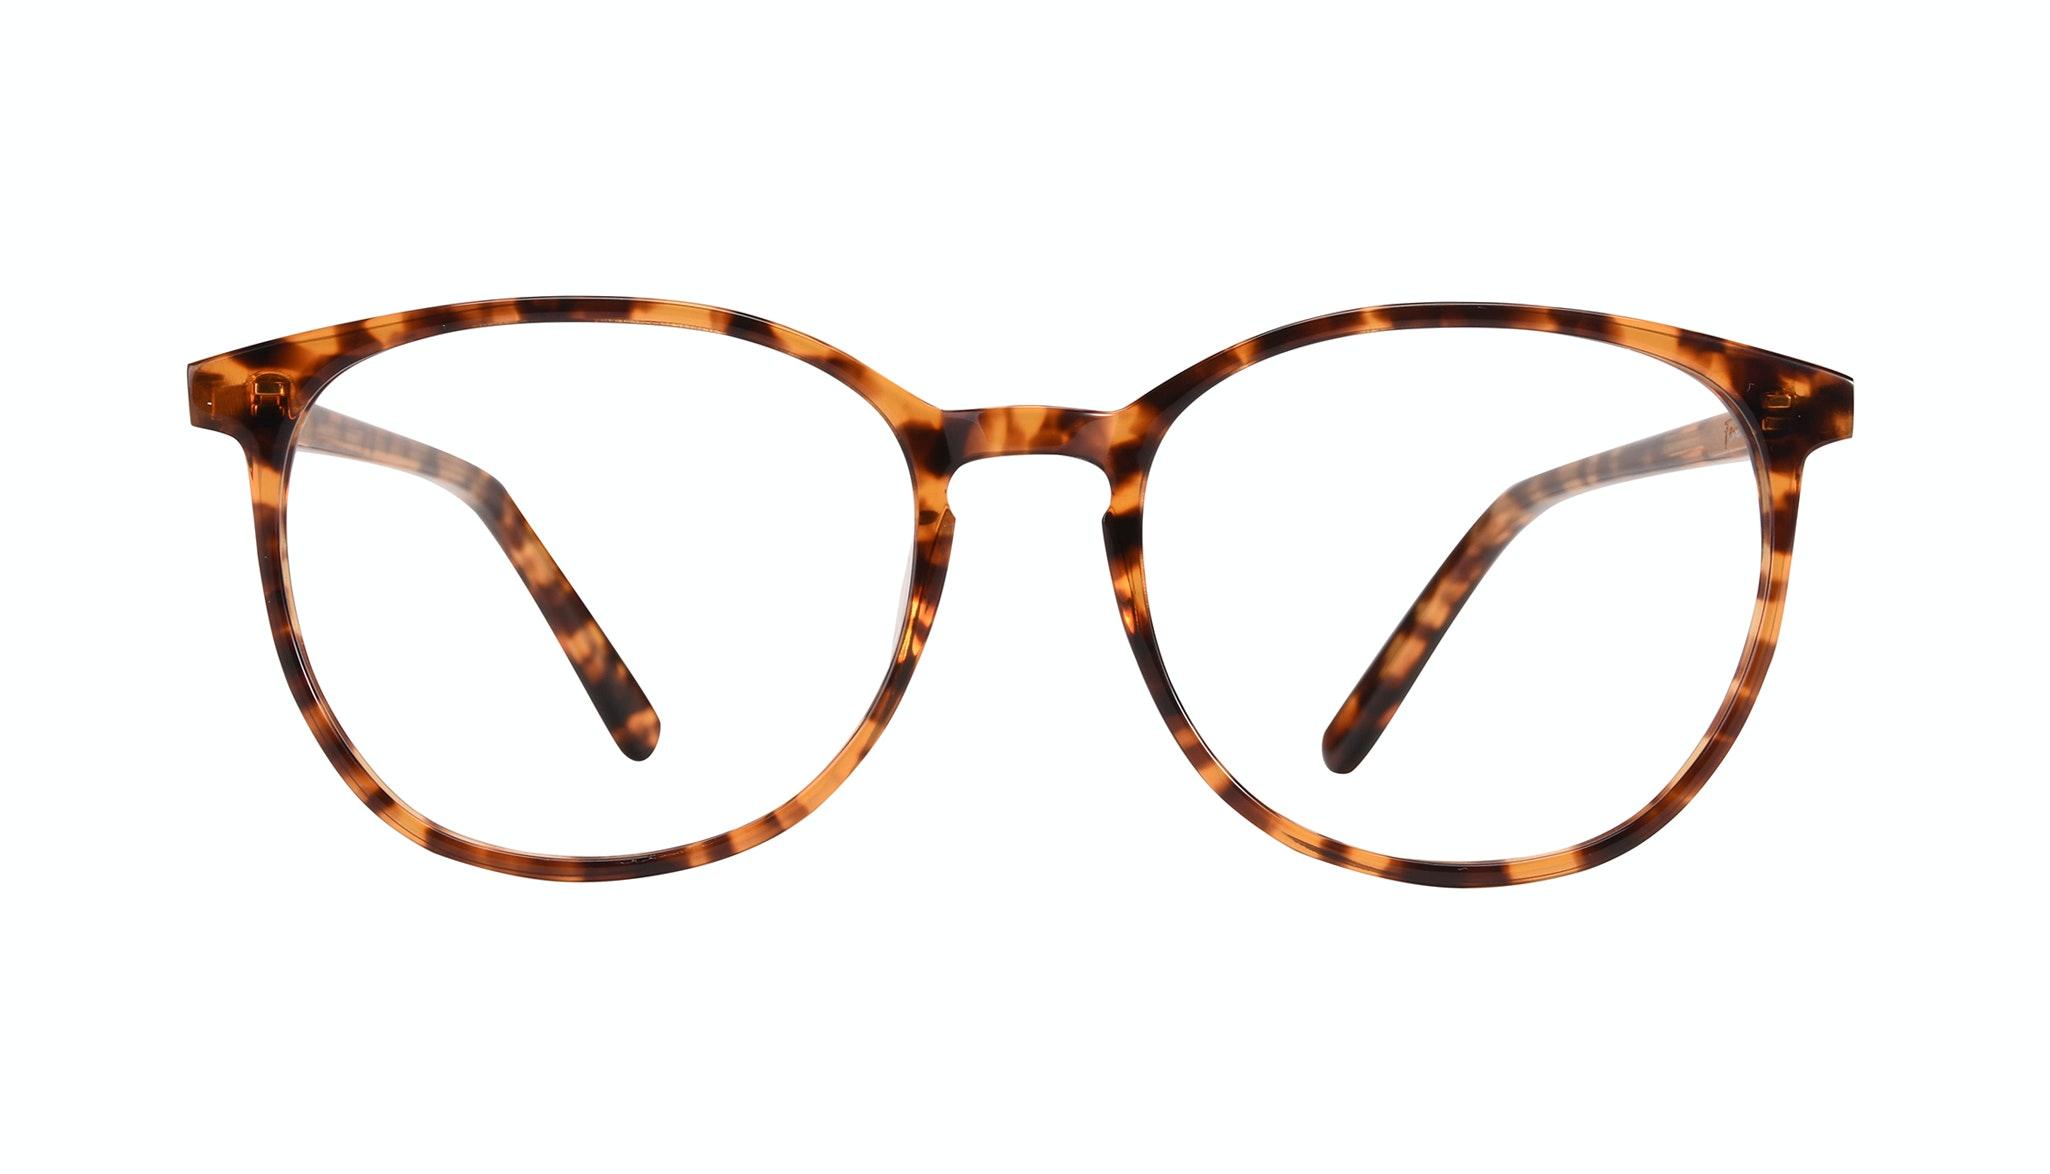 Affordable Fashion Glasses Round Eyeglasses Women Femme Libre Josette